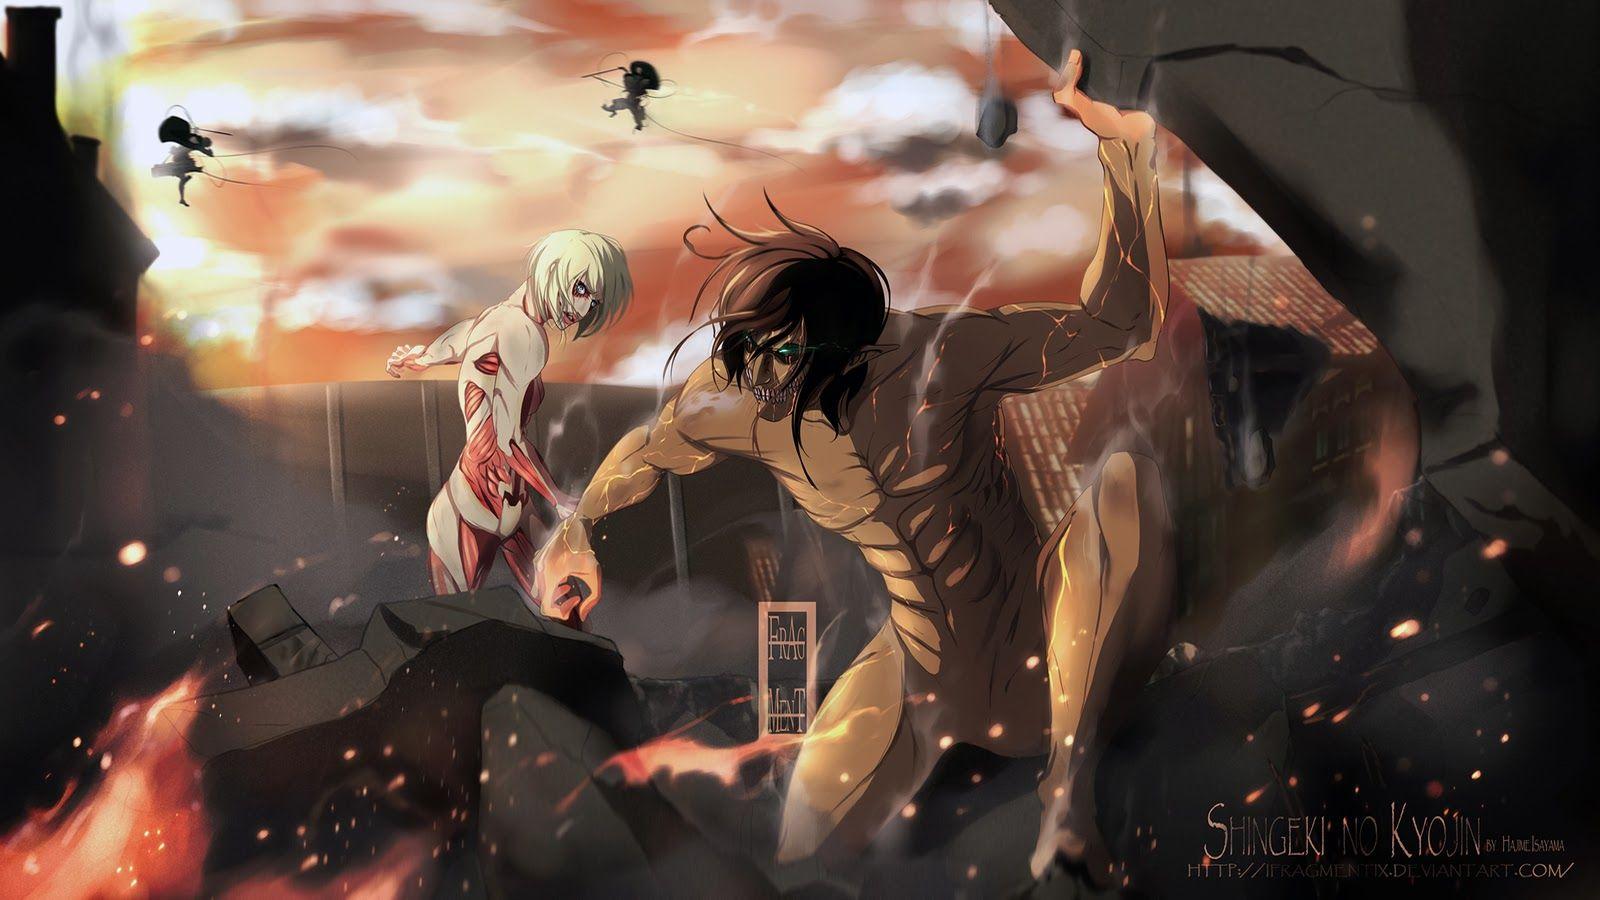 Shingeki No Kyojin Wallpaper Buscar Con Google Attack On Titan